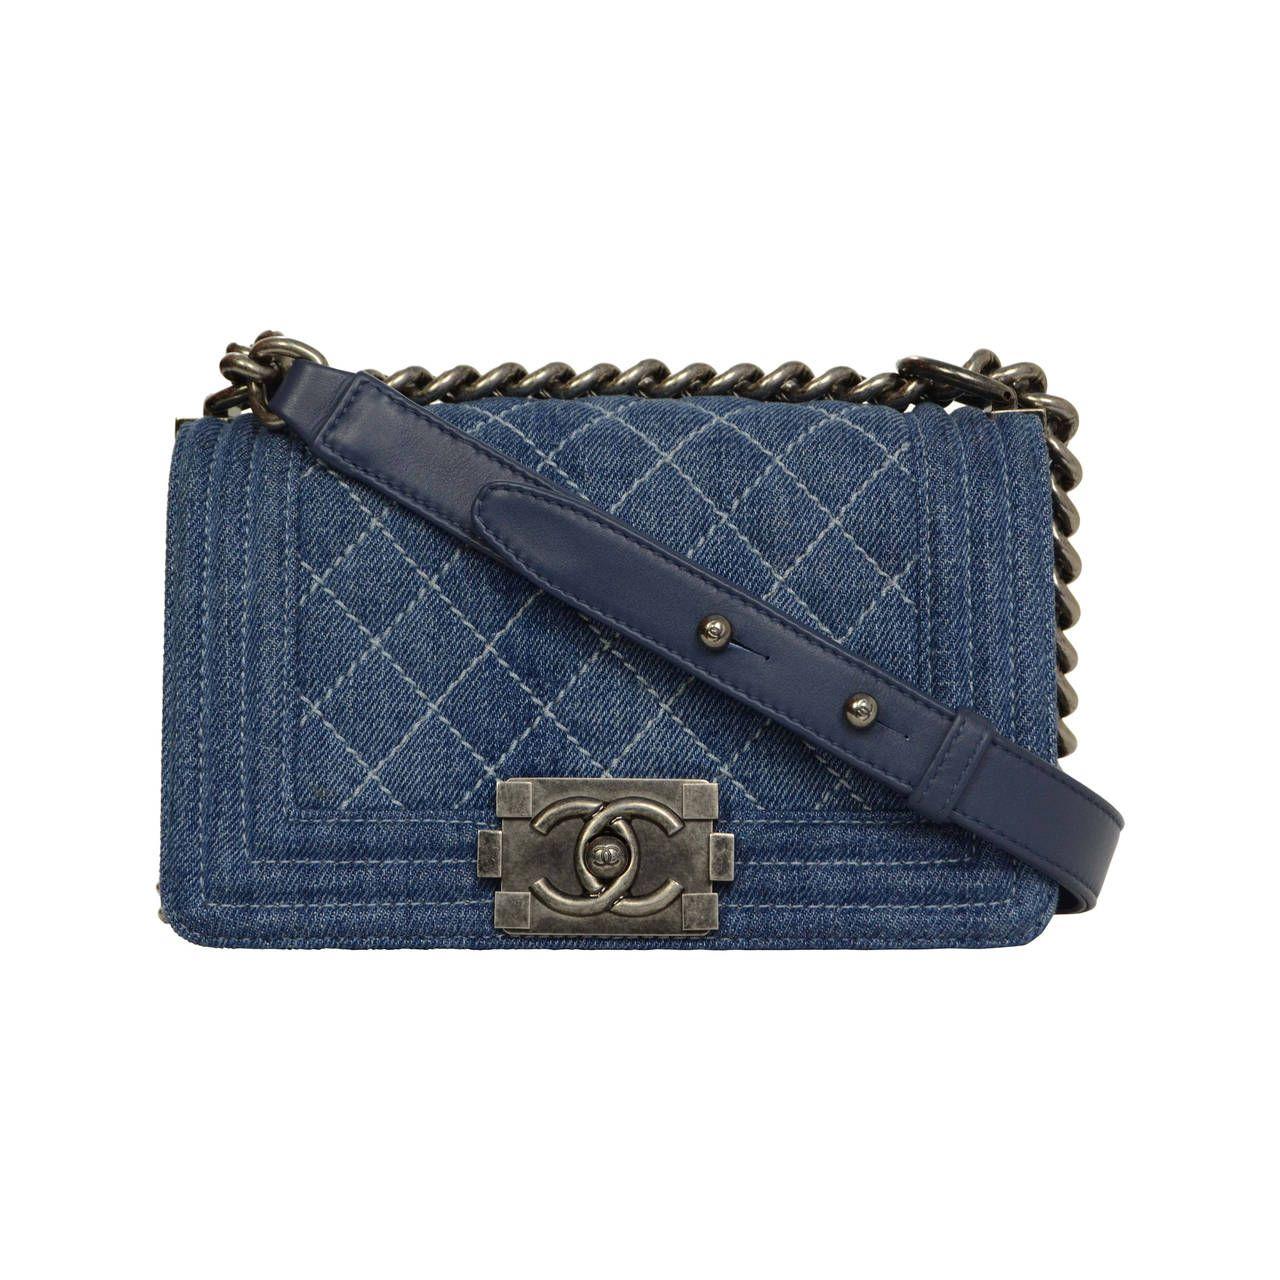 Chanel handbag superb vintage chanel bag vintage leather - Fashion 2000 2020 Chanel Blue Denim Mini Boy Bag Shw From A Collection